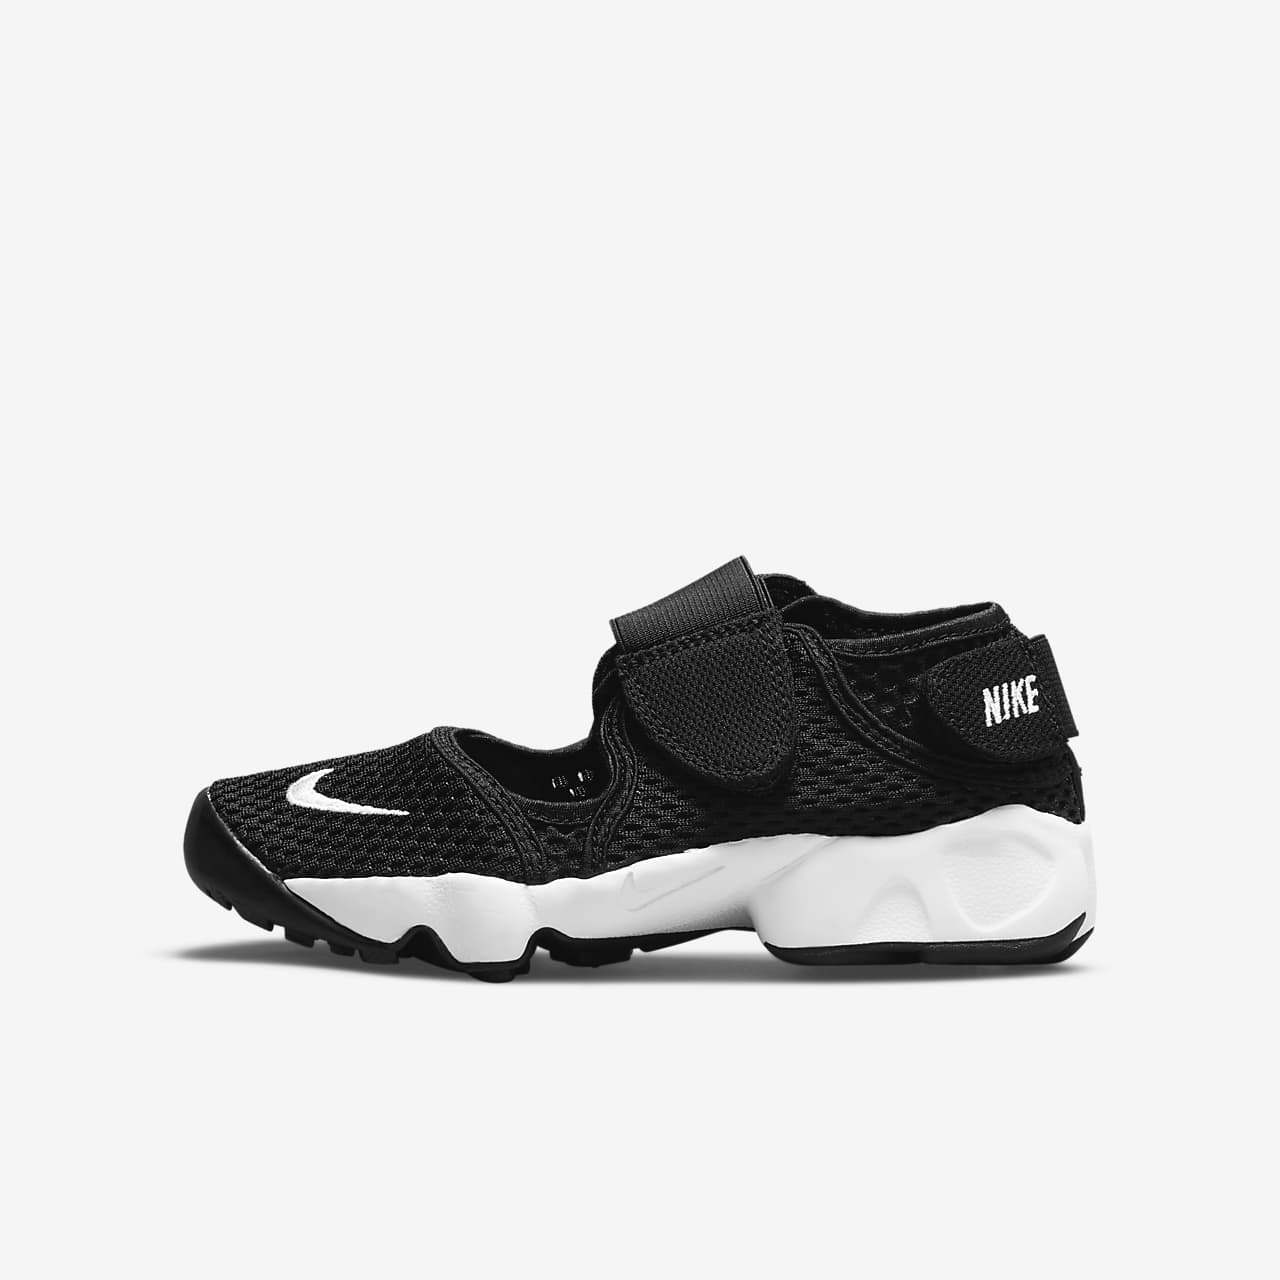 Nike Rift Schoen kleuters/kids